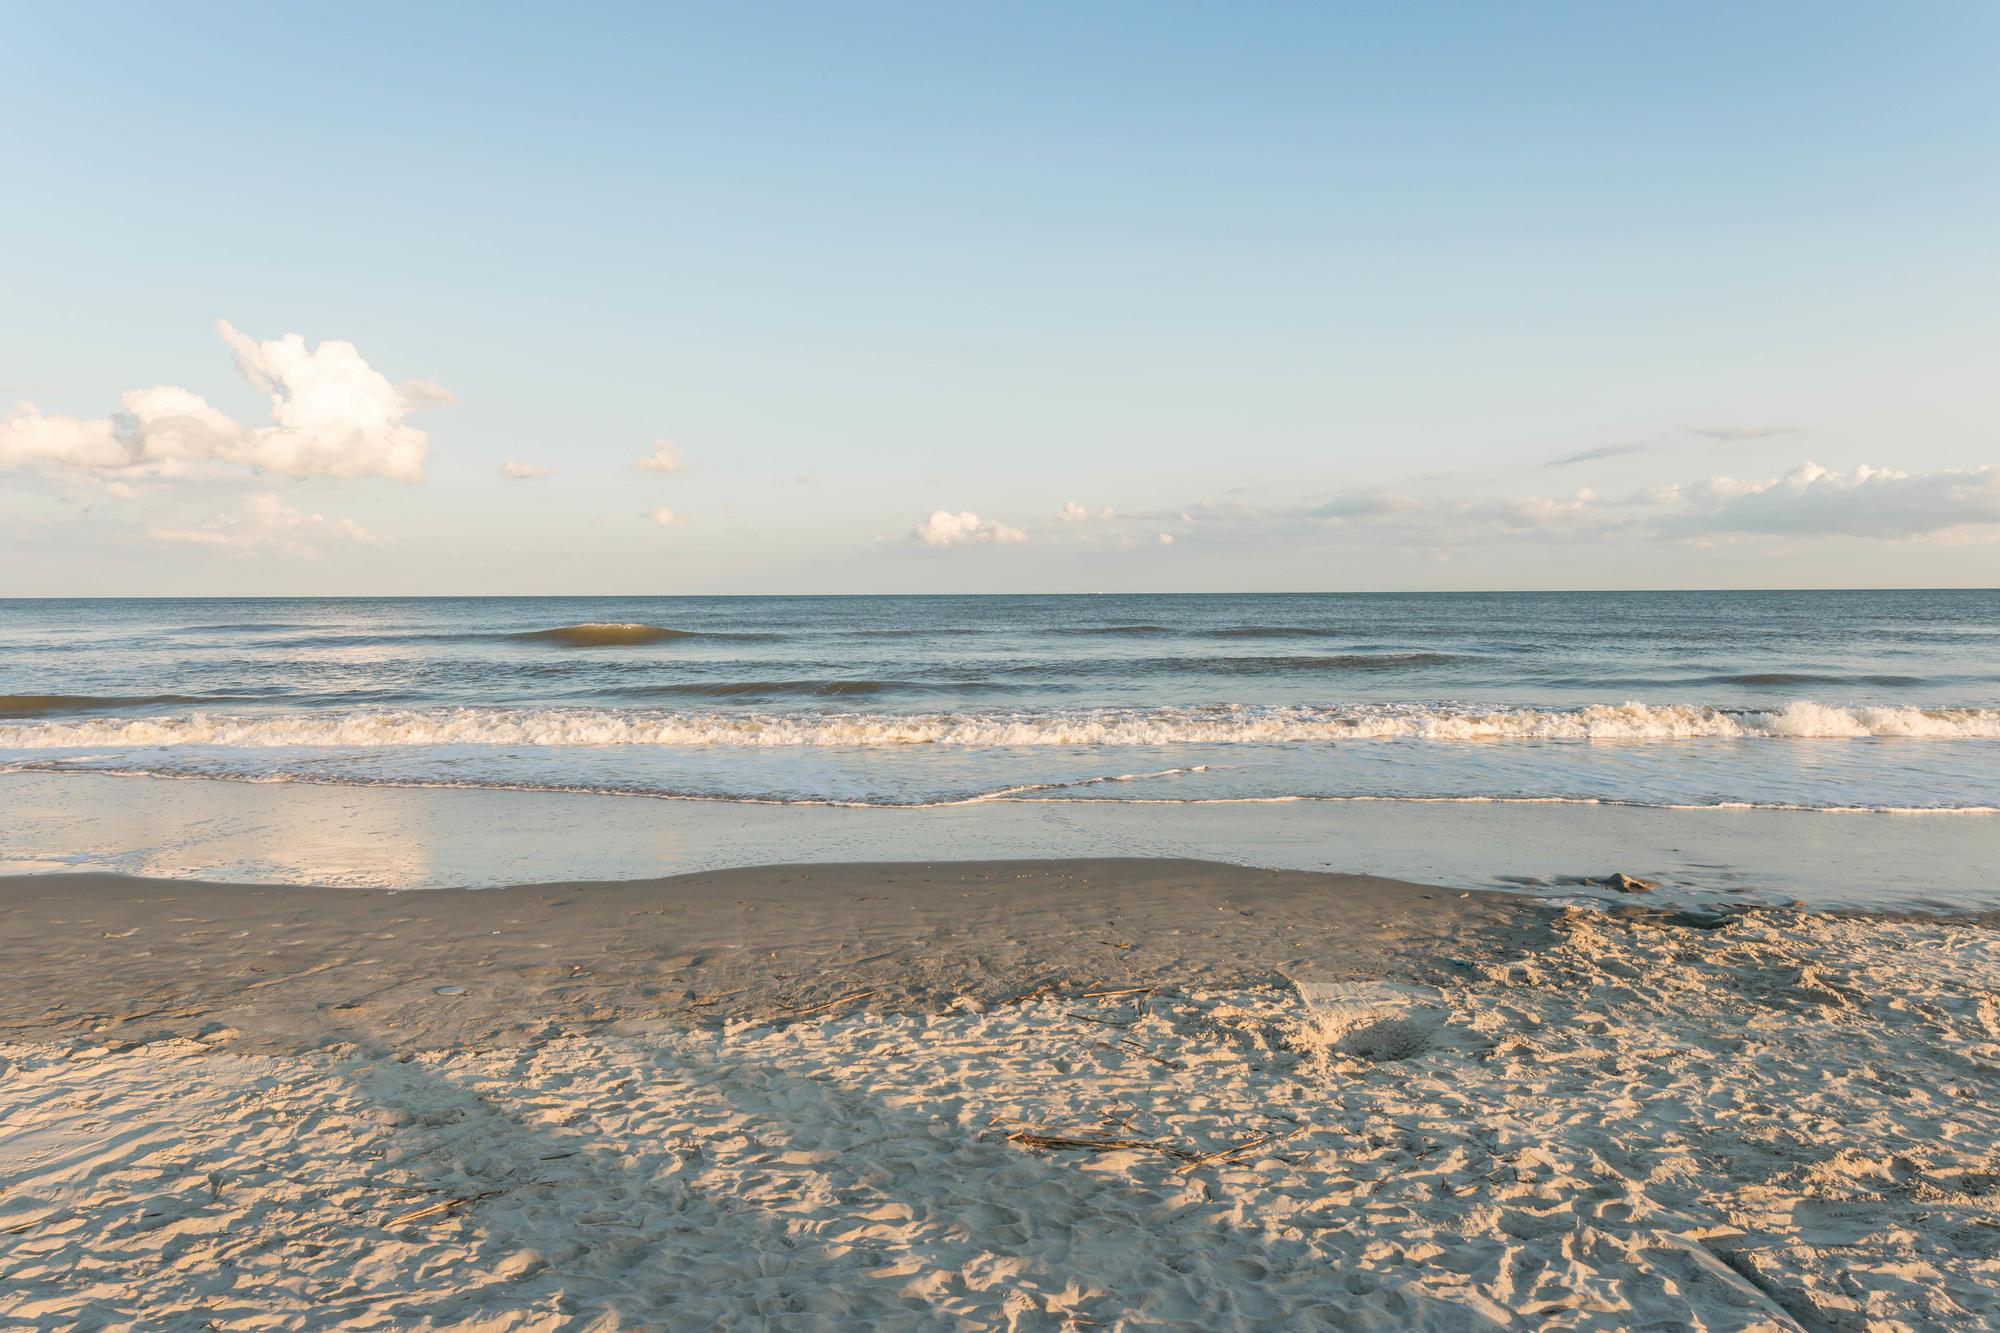 The beach outside of Charleston, South Carolina